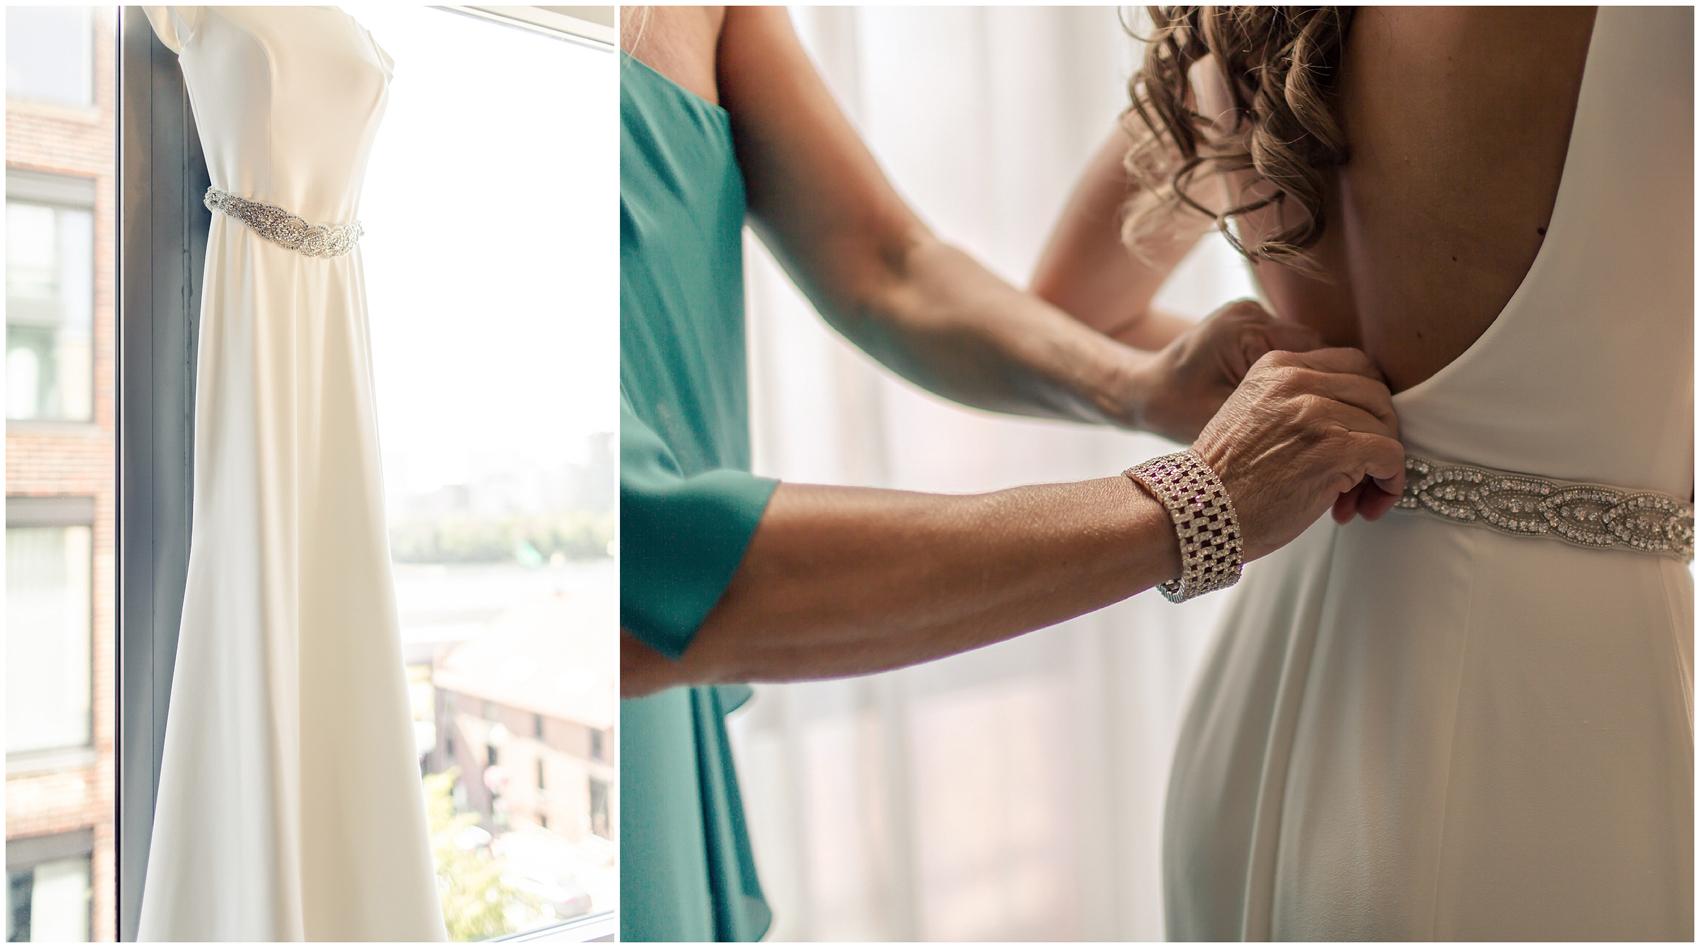 ritz-carlton-georgetown-wedding-washington-dc-photography-liz-stewart-photo-00006